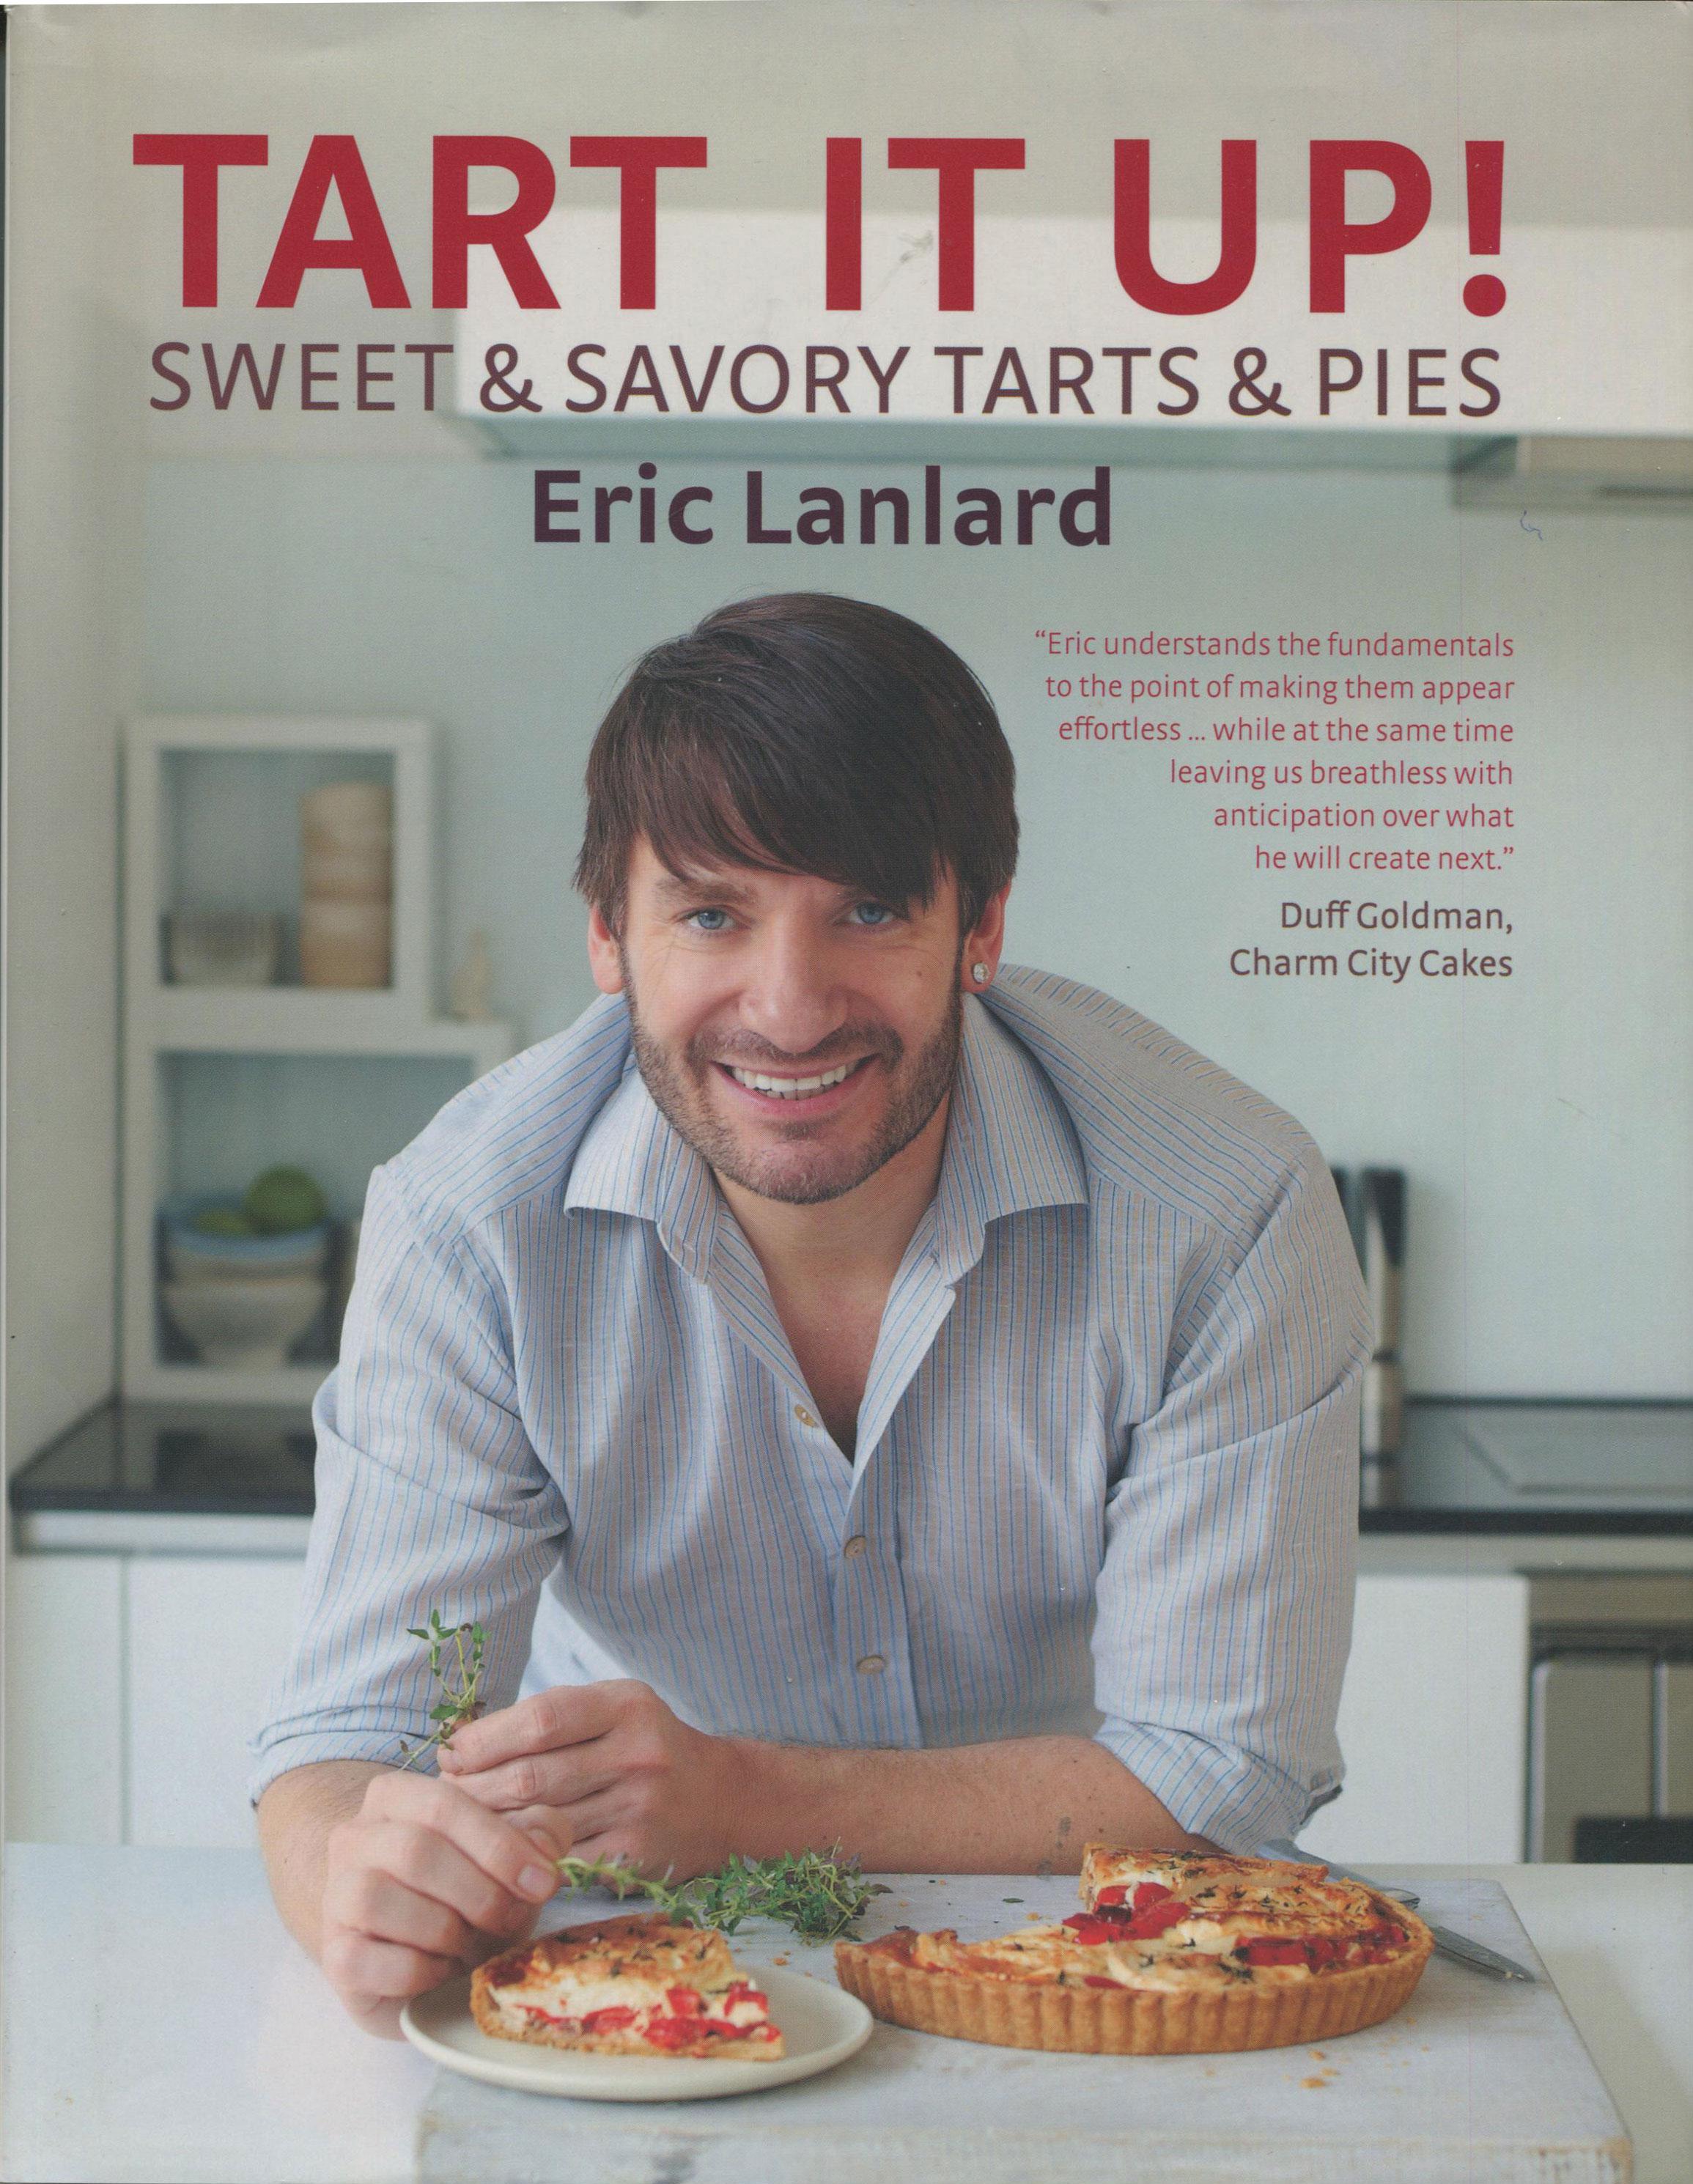 TBT Cookbook Review: Tart It Up!